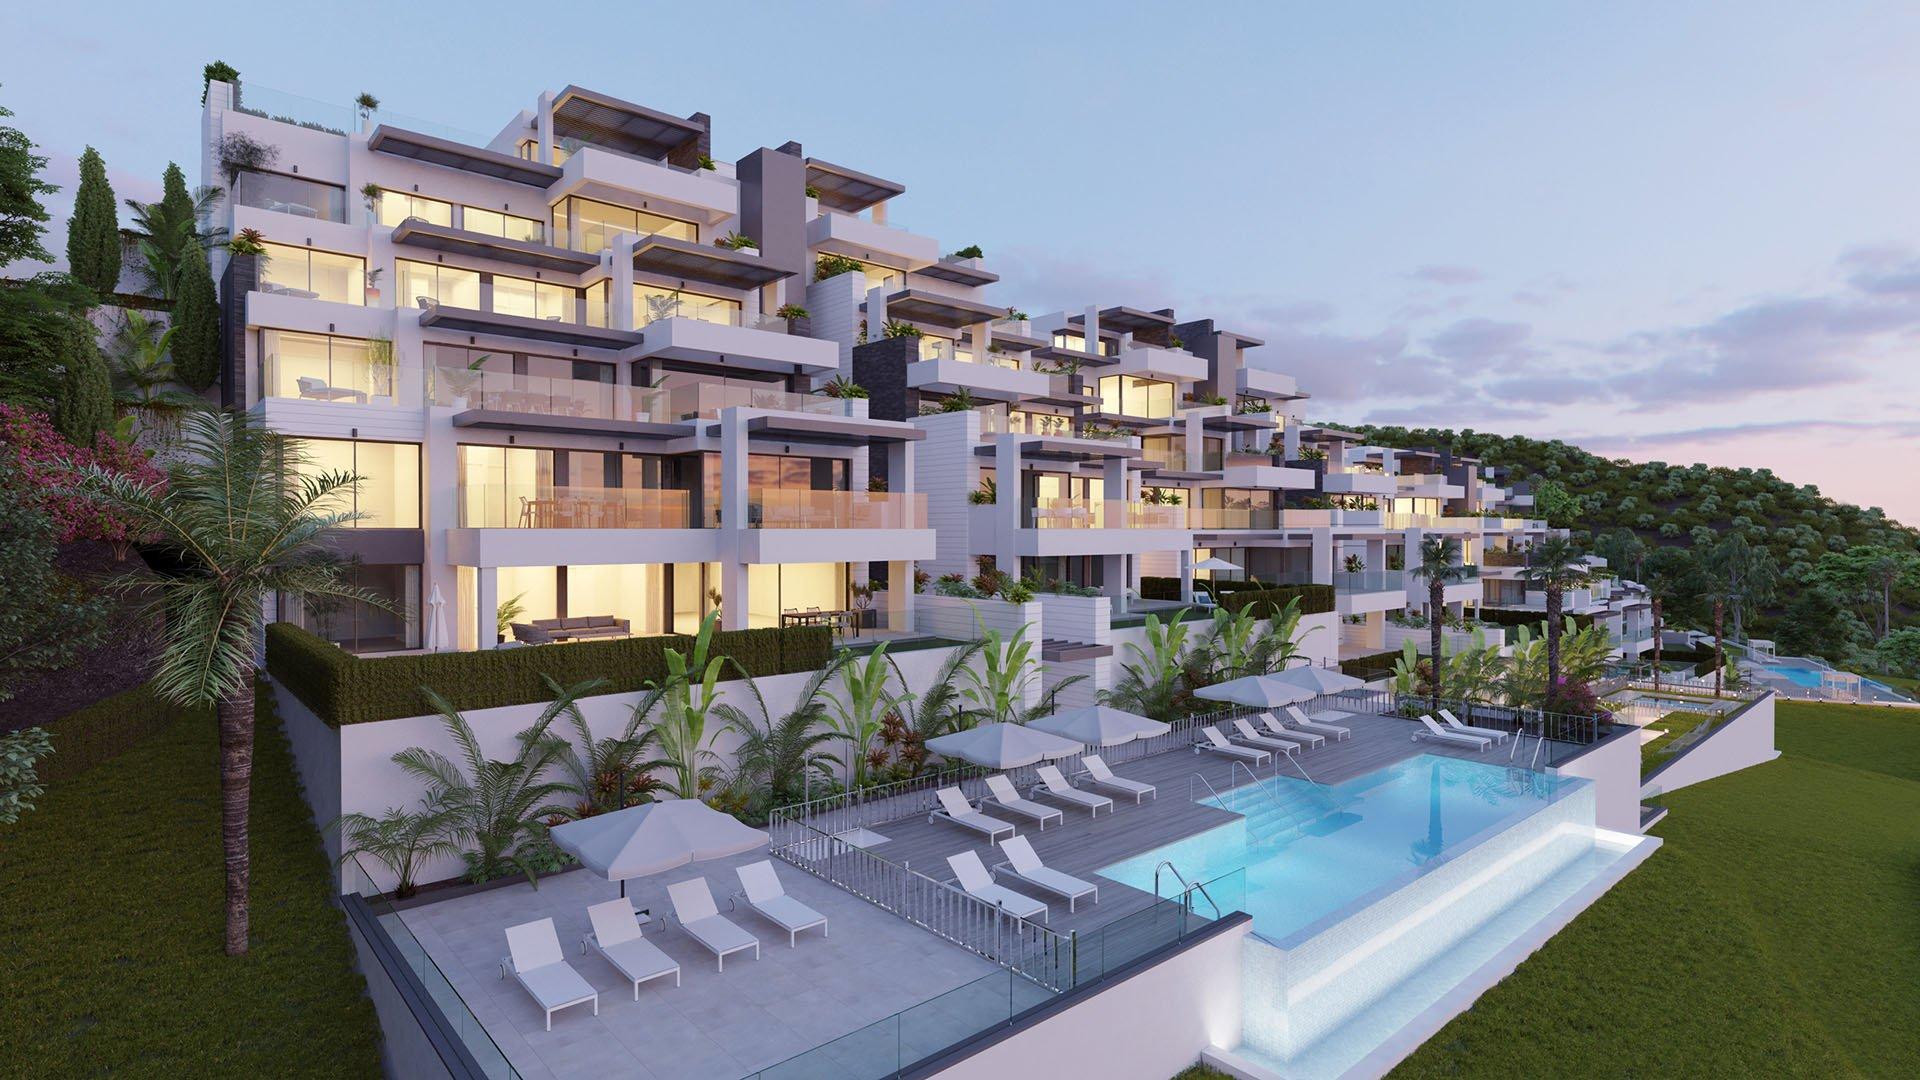 Aqualina: Exclusive penthouses with panoramic sea views in Benahavís